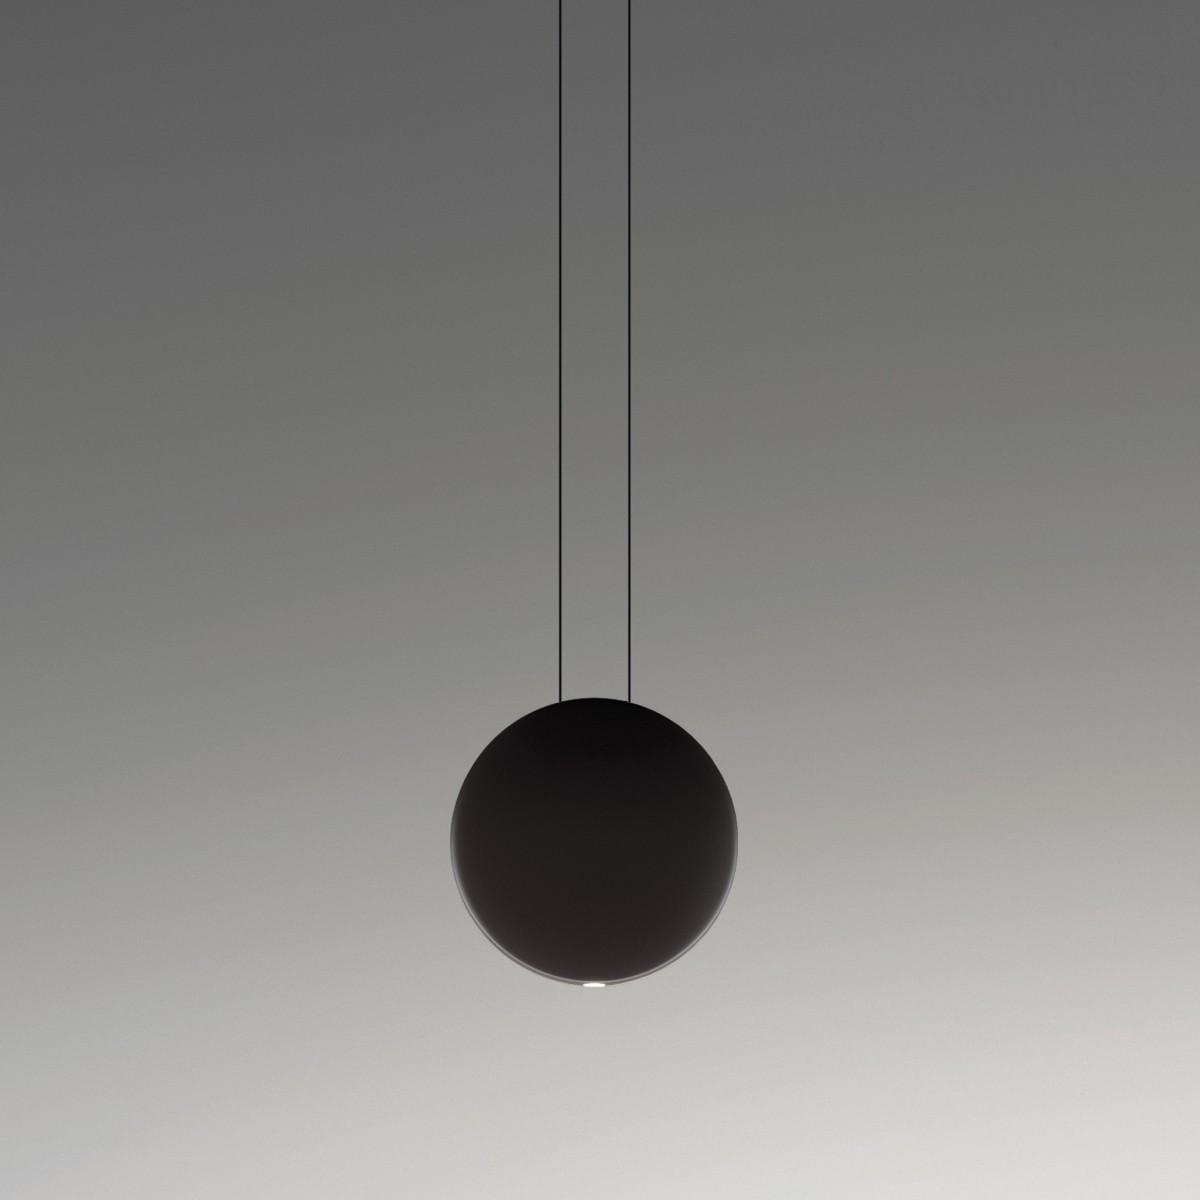 Vibia Cosmos 2501 Pendelleuchte, dunkelbraun matt